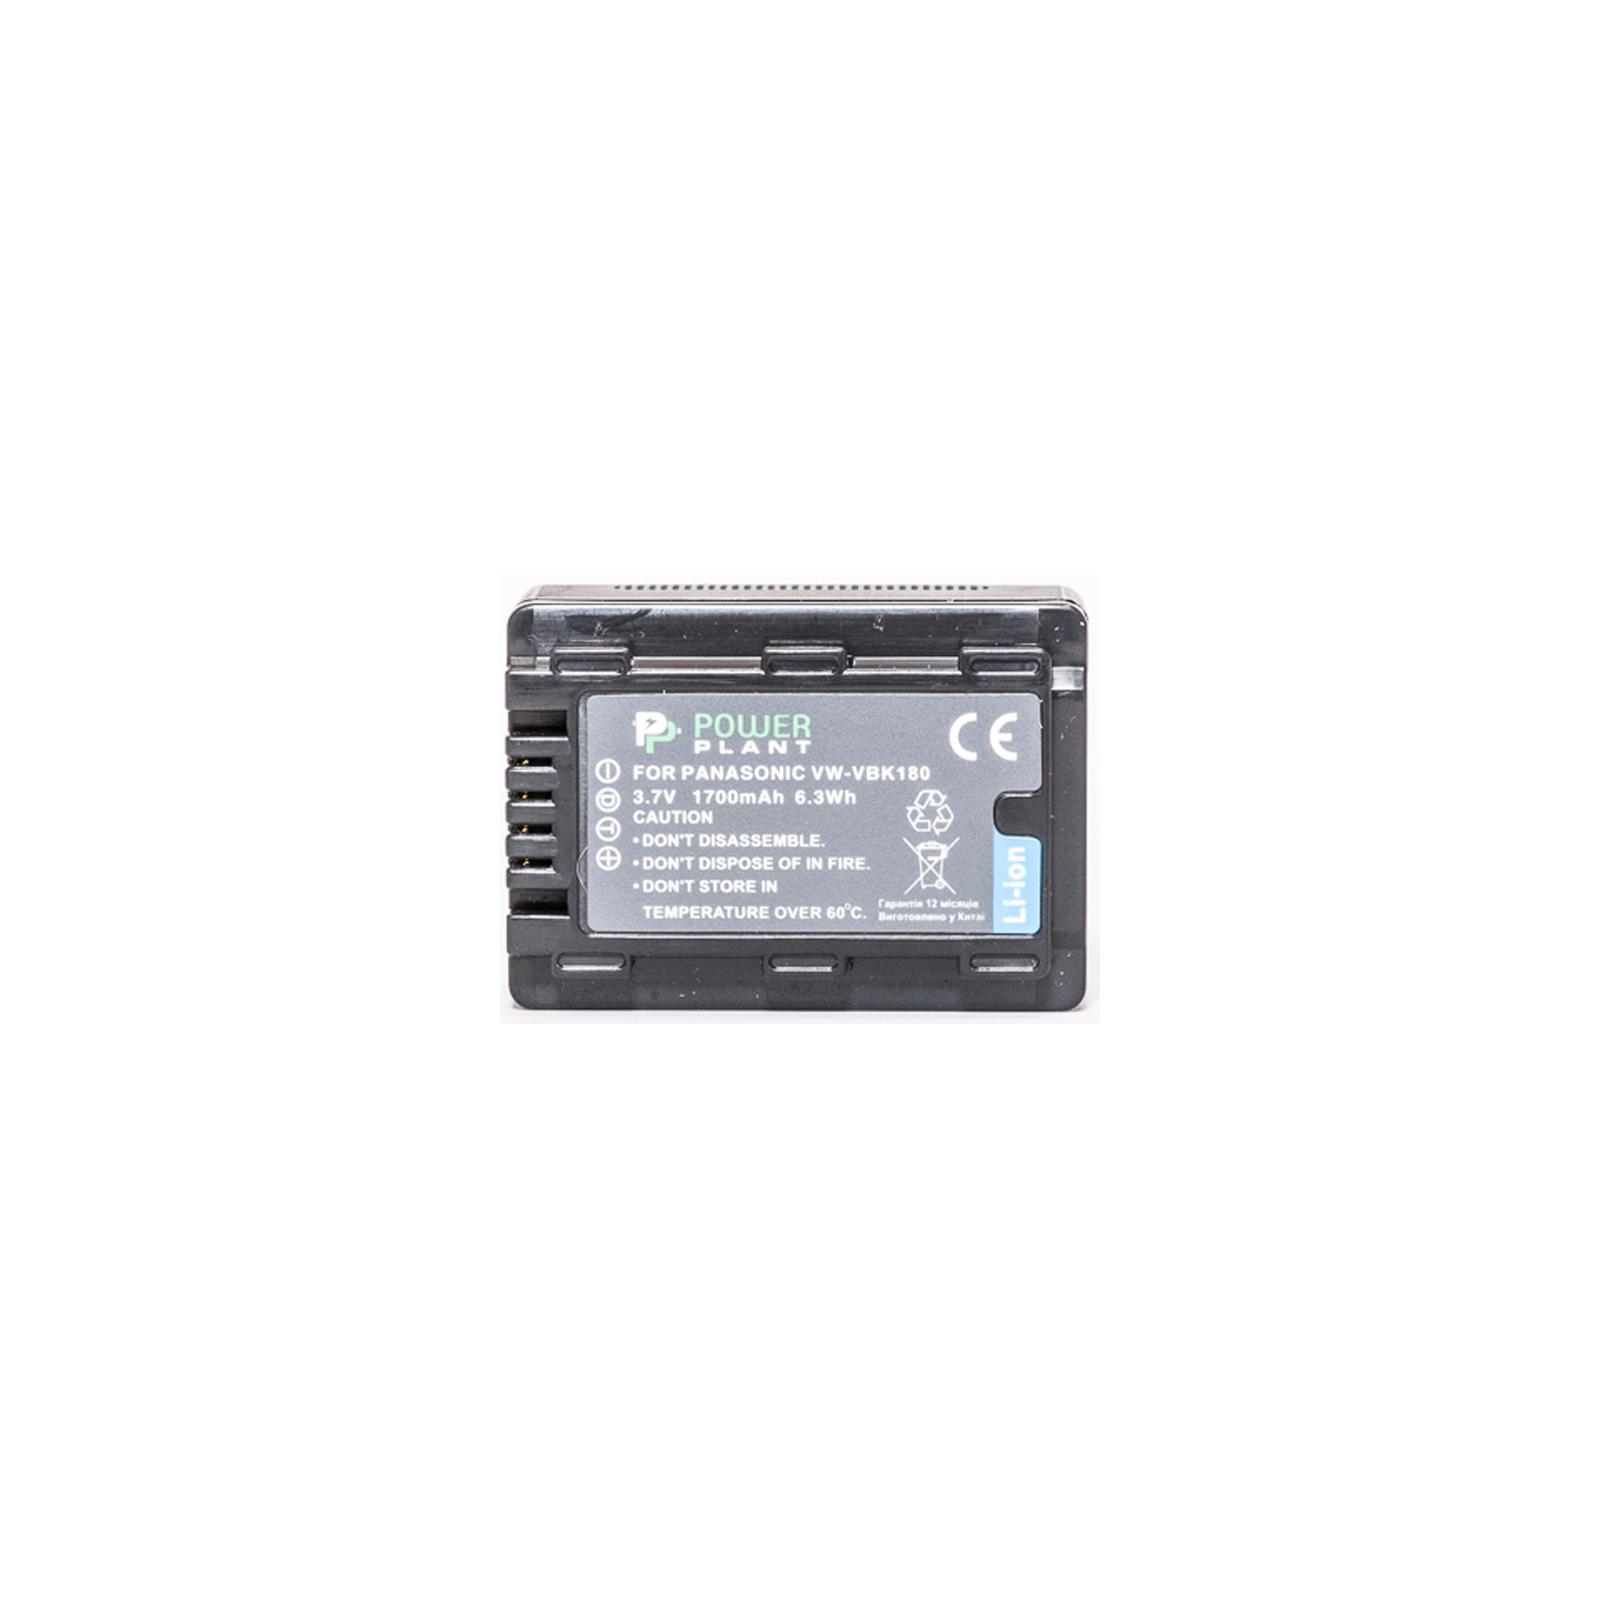 Аккумулятор к фото/видео PowerPlant Panasonic VW-VBK180 (DV00DV1291) изображение 2